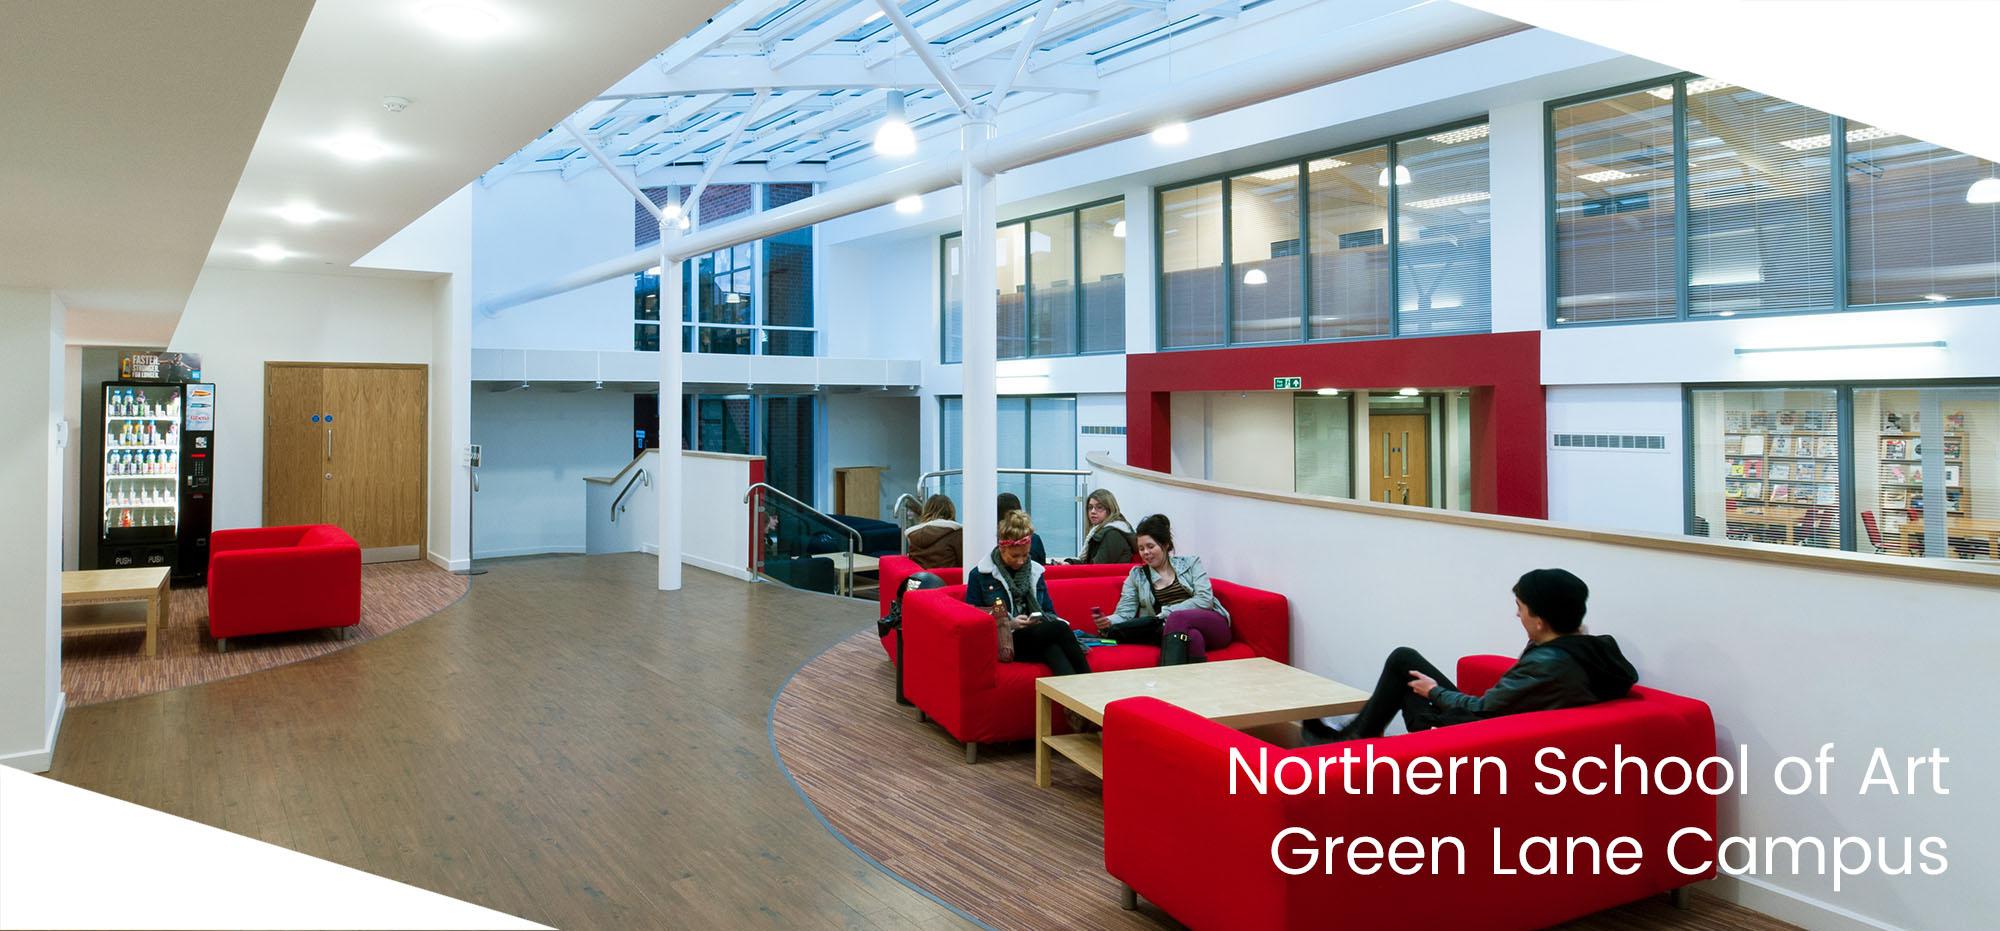 Niven Architects - Northern School of Art, Green Lane Campus.jpg